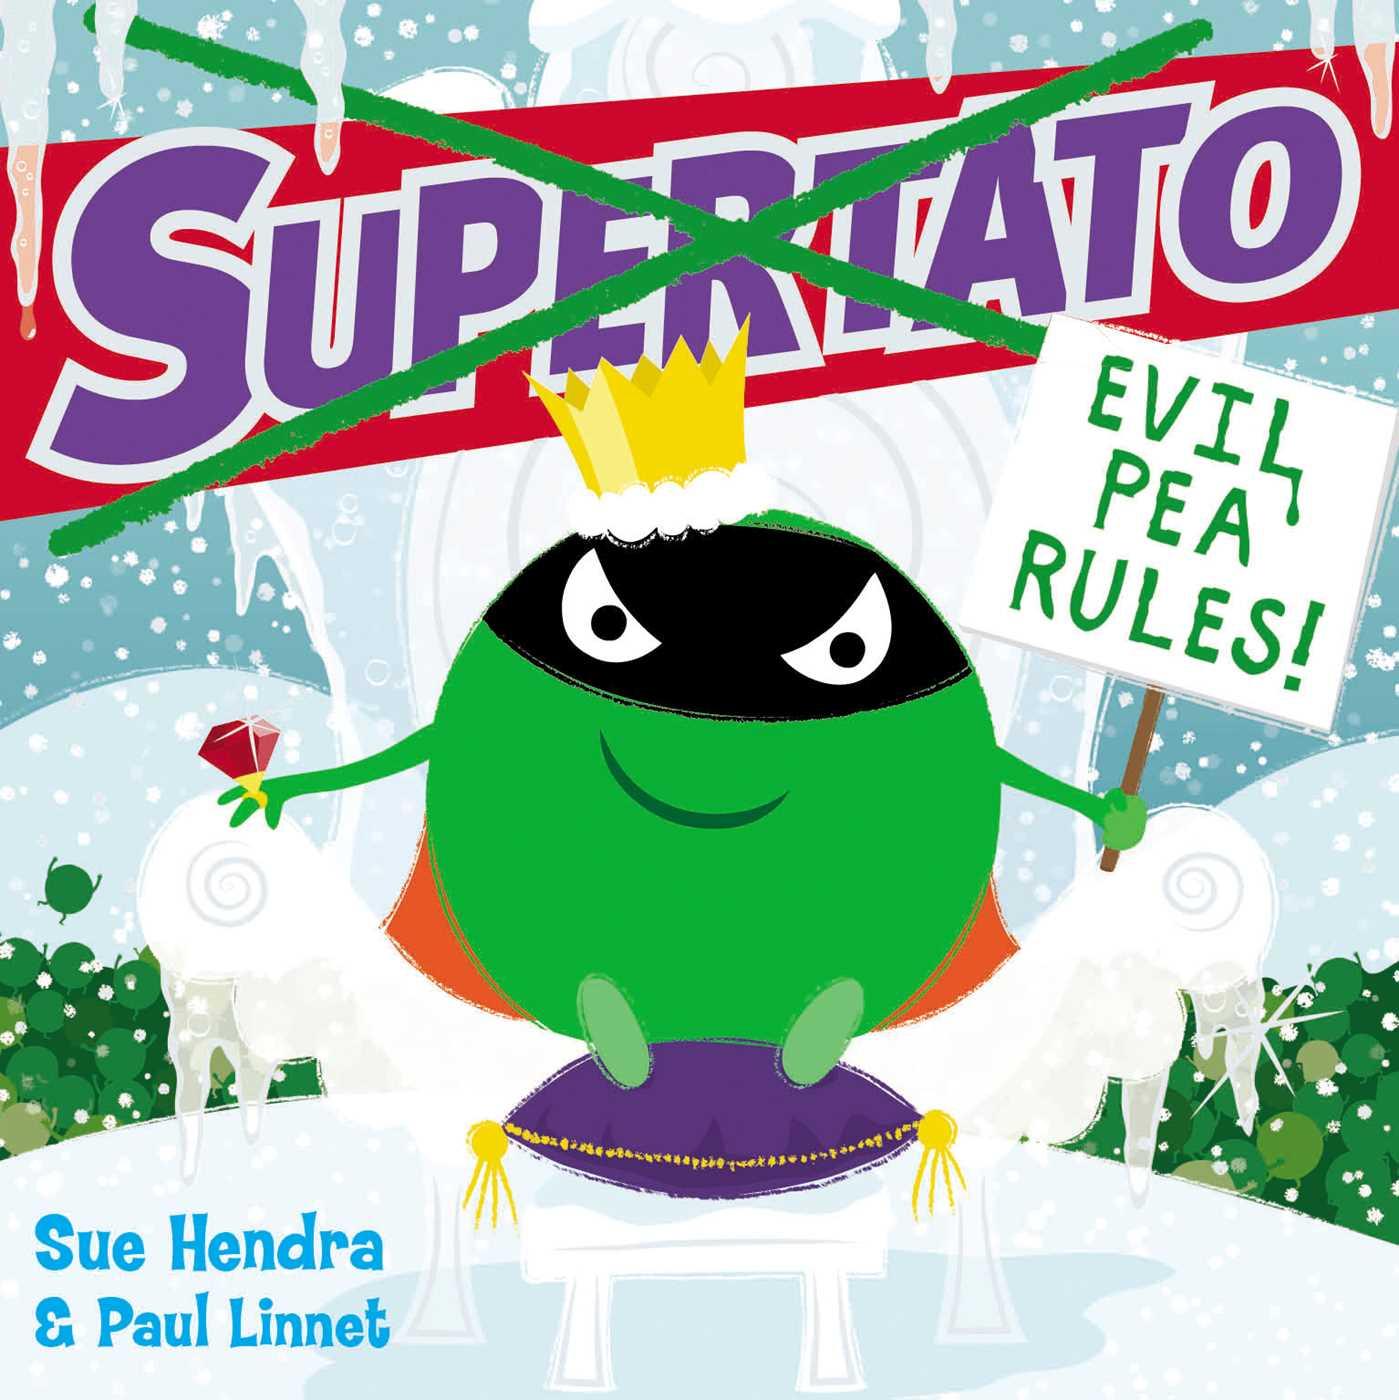 Supertato evil pea rules 9781471144080 hr